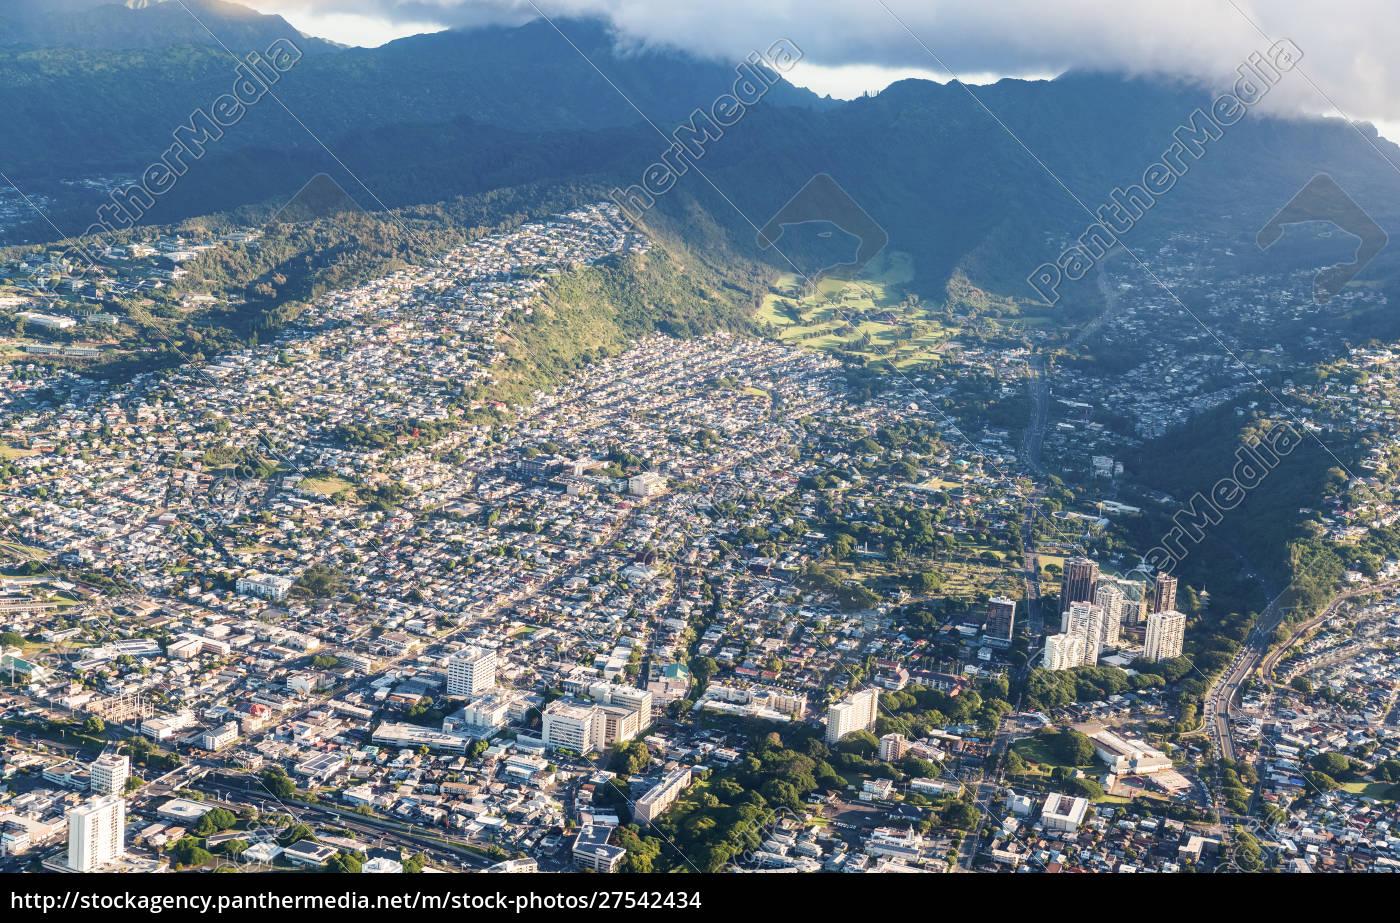 luftaufnahme, von, honolulu, oahu, hawaii - 27542434